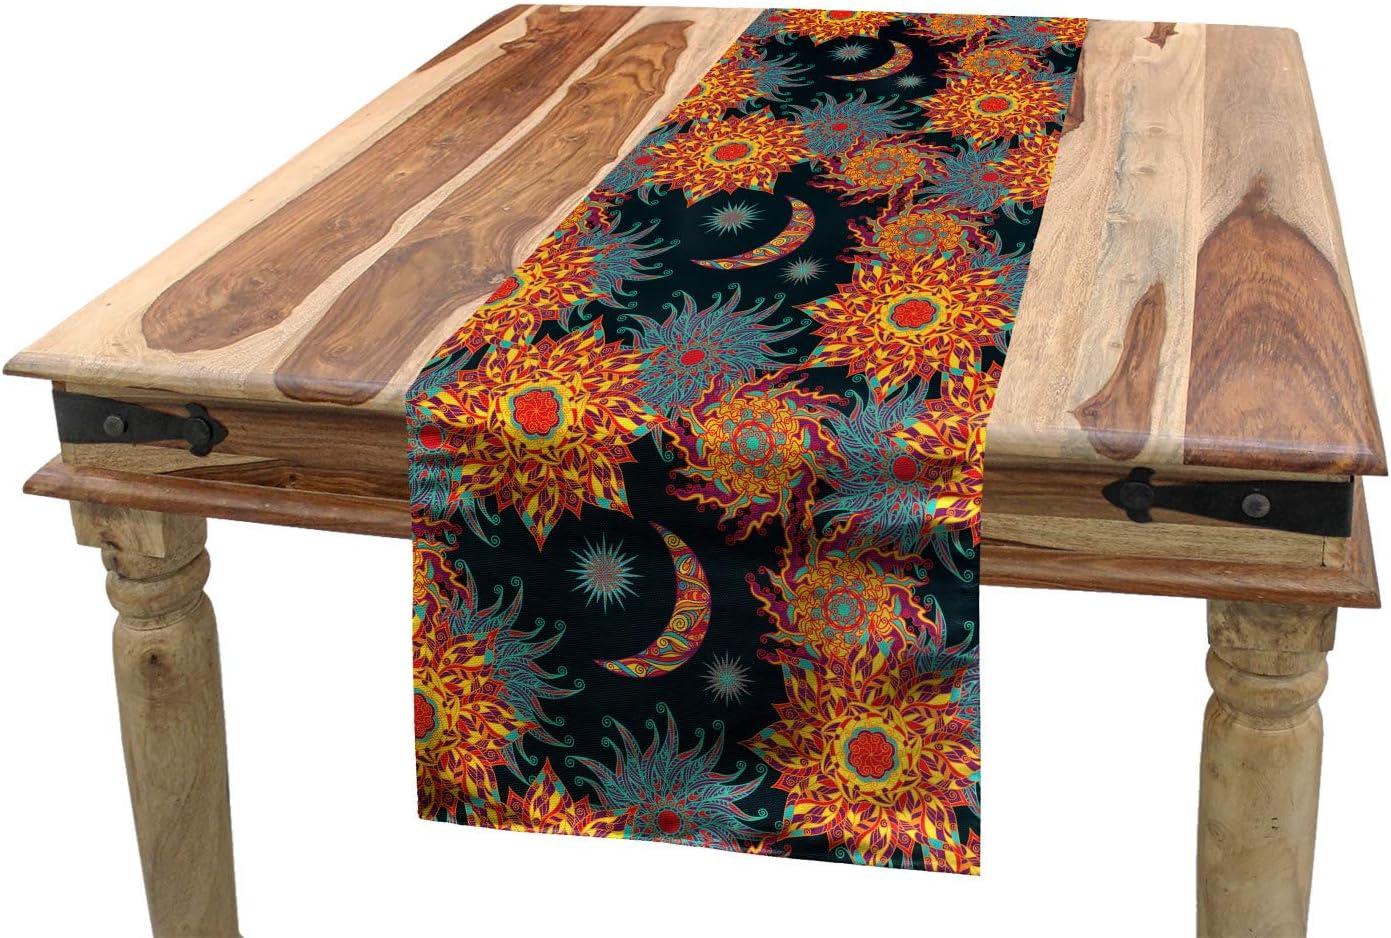 home decor silk floral arrangement floral decor tropical.htm amazon com lunarable sun and moon table runner  tropical floral  lunarable sun and moon table runner